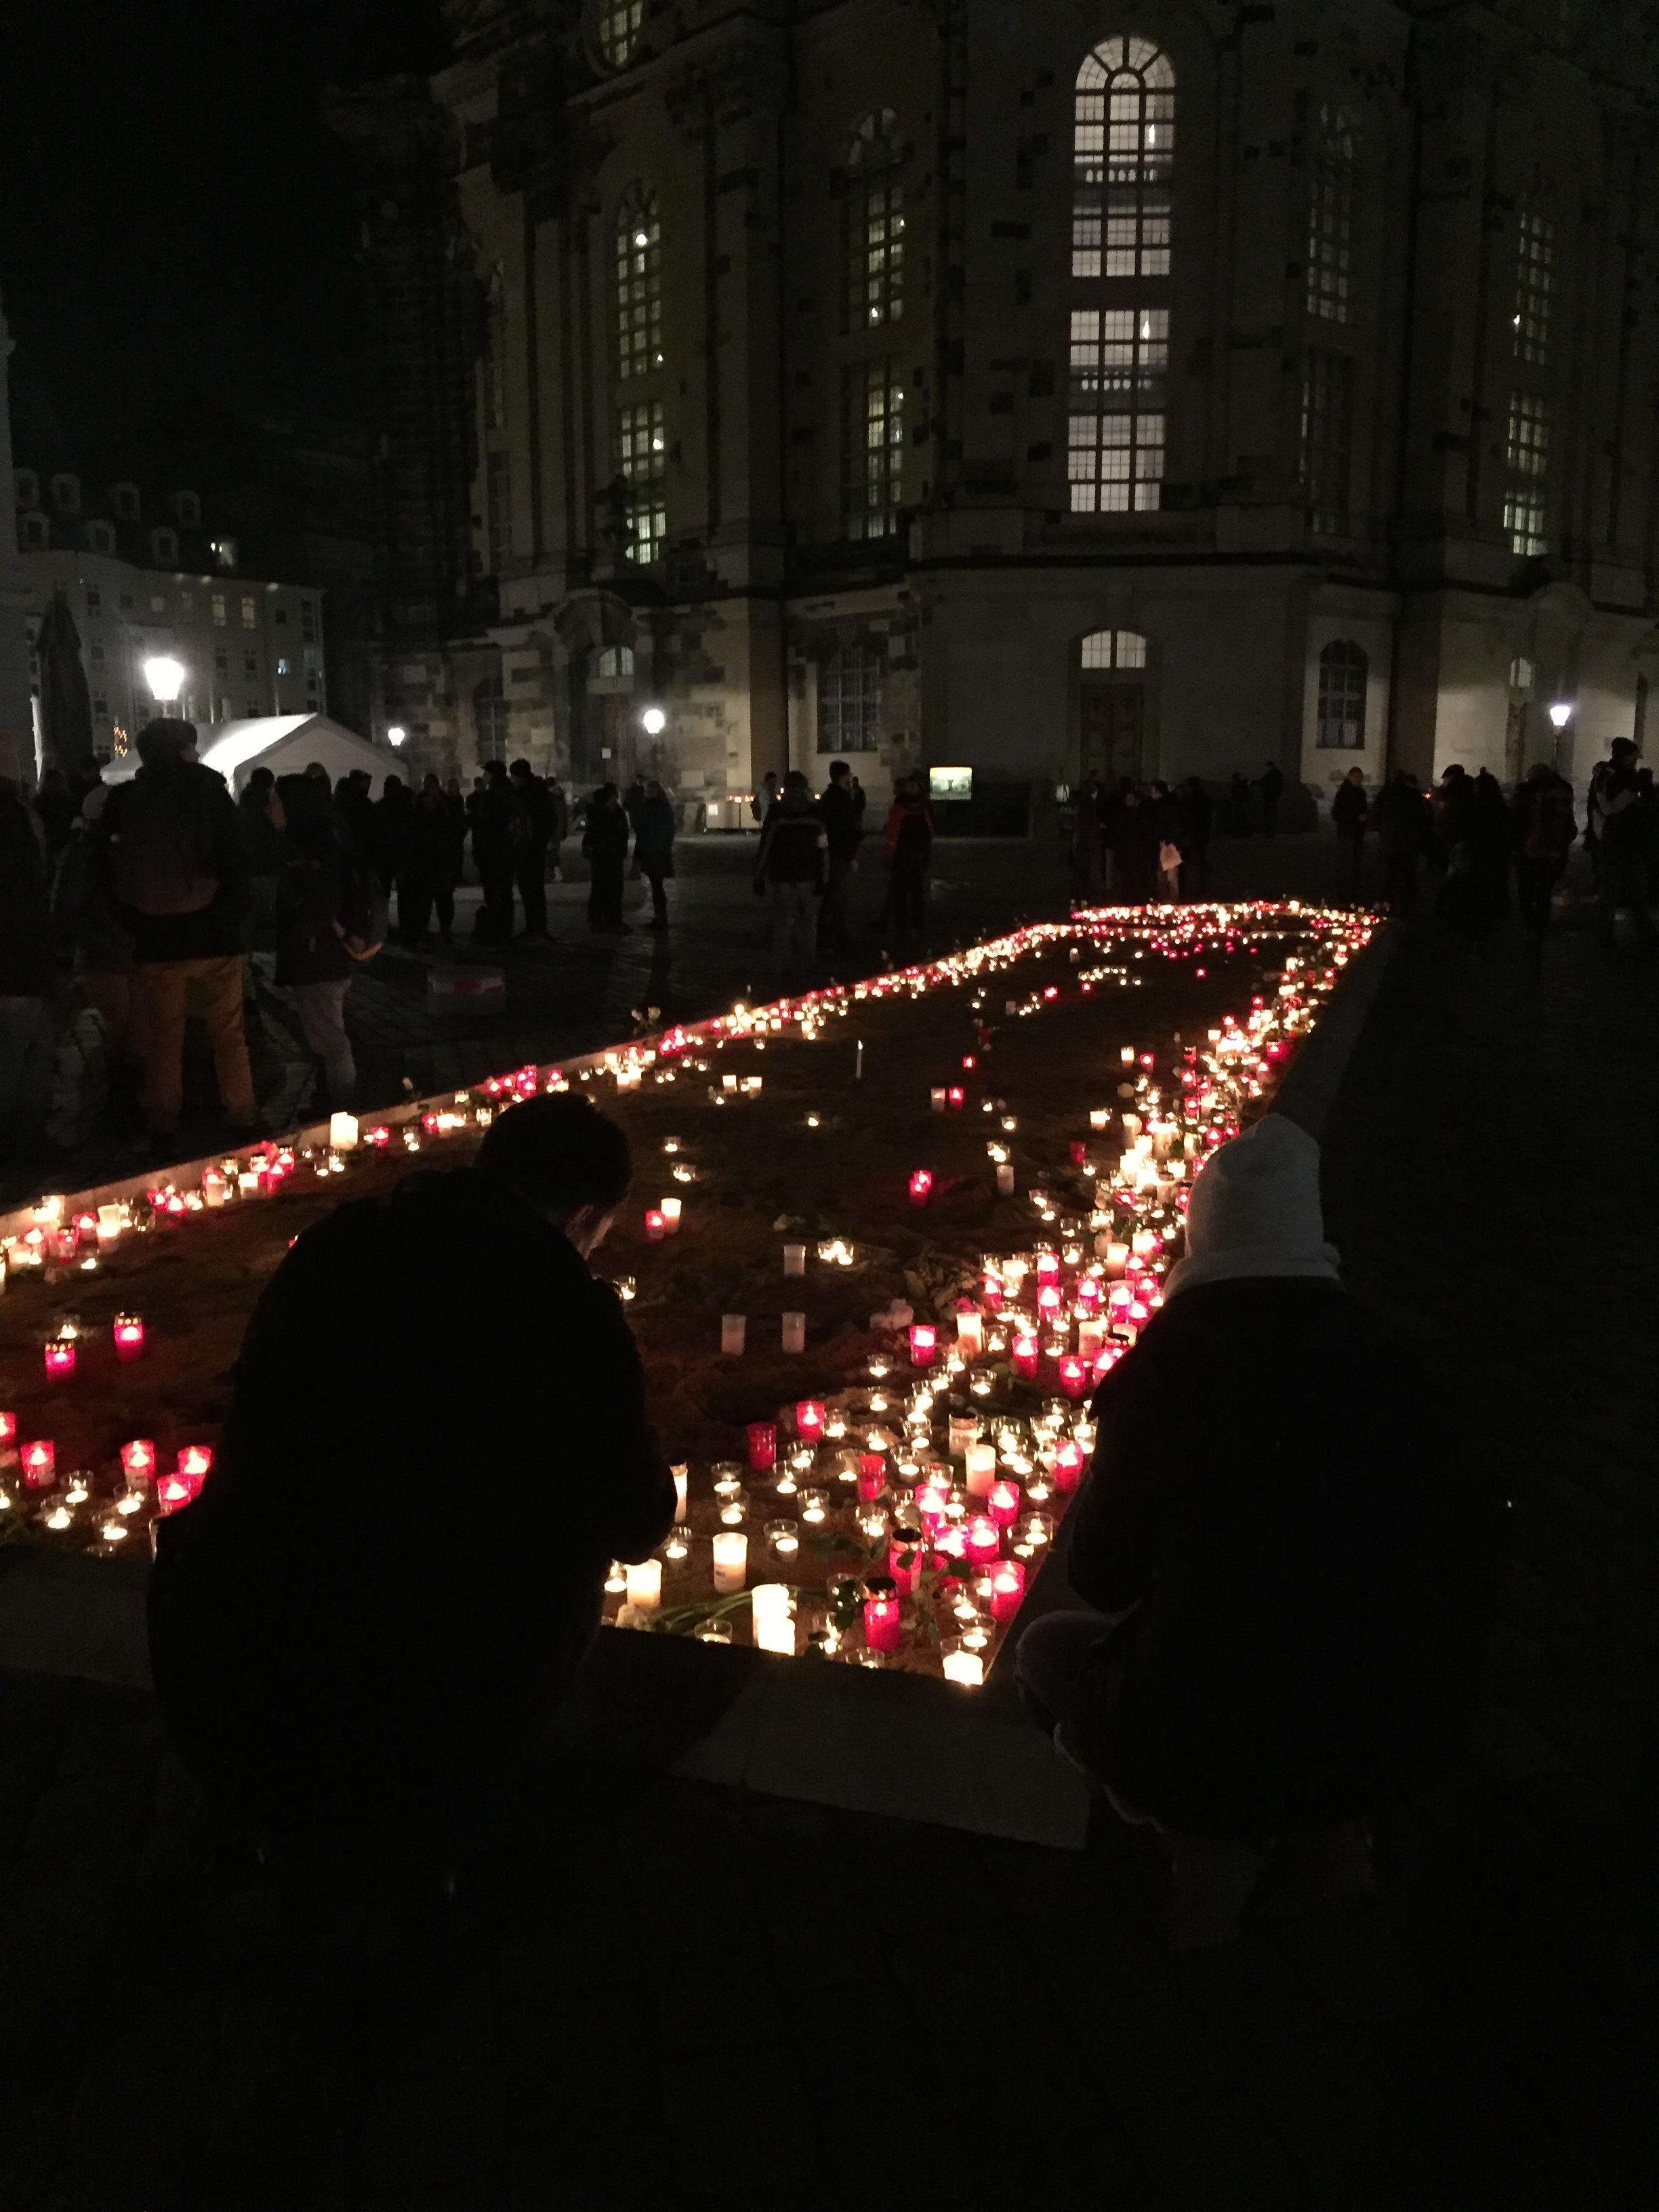 The Candle Vigil